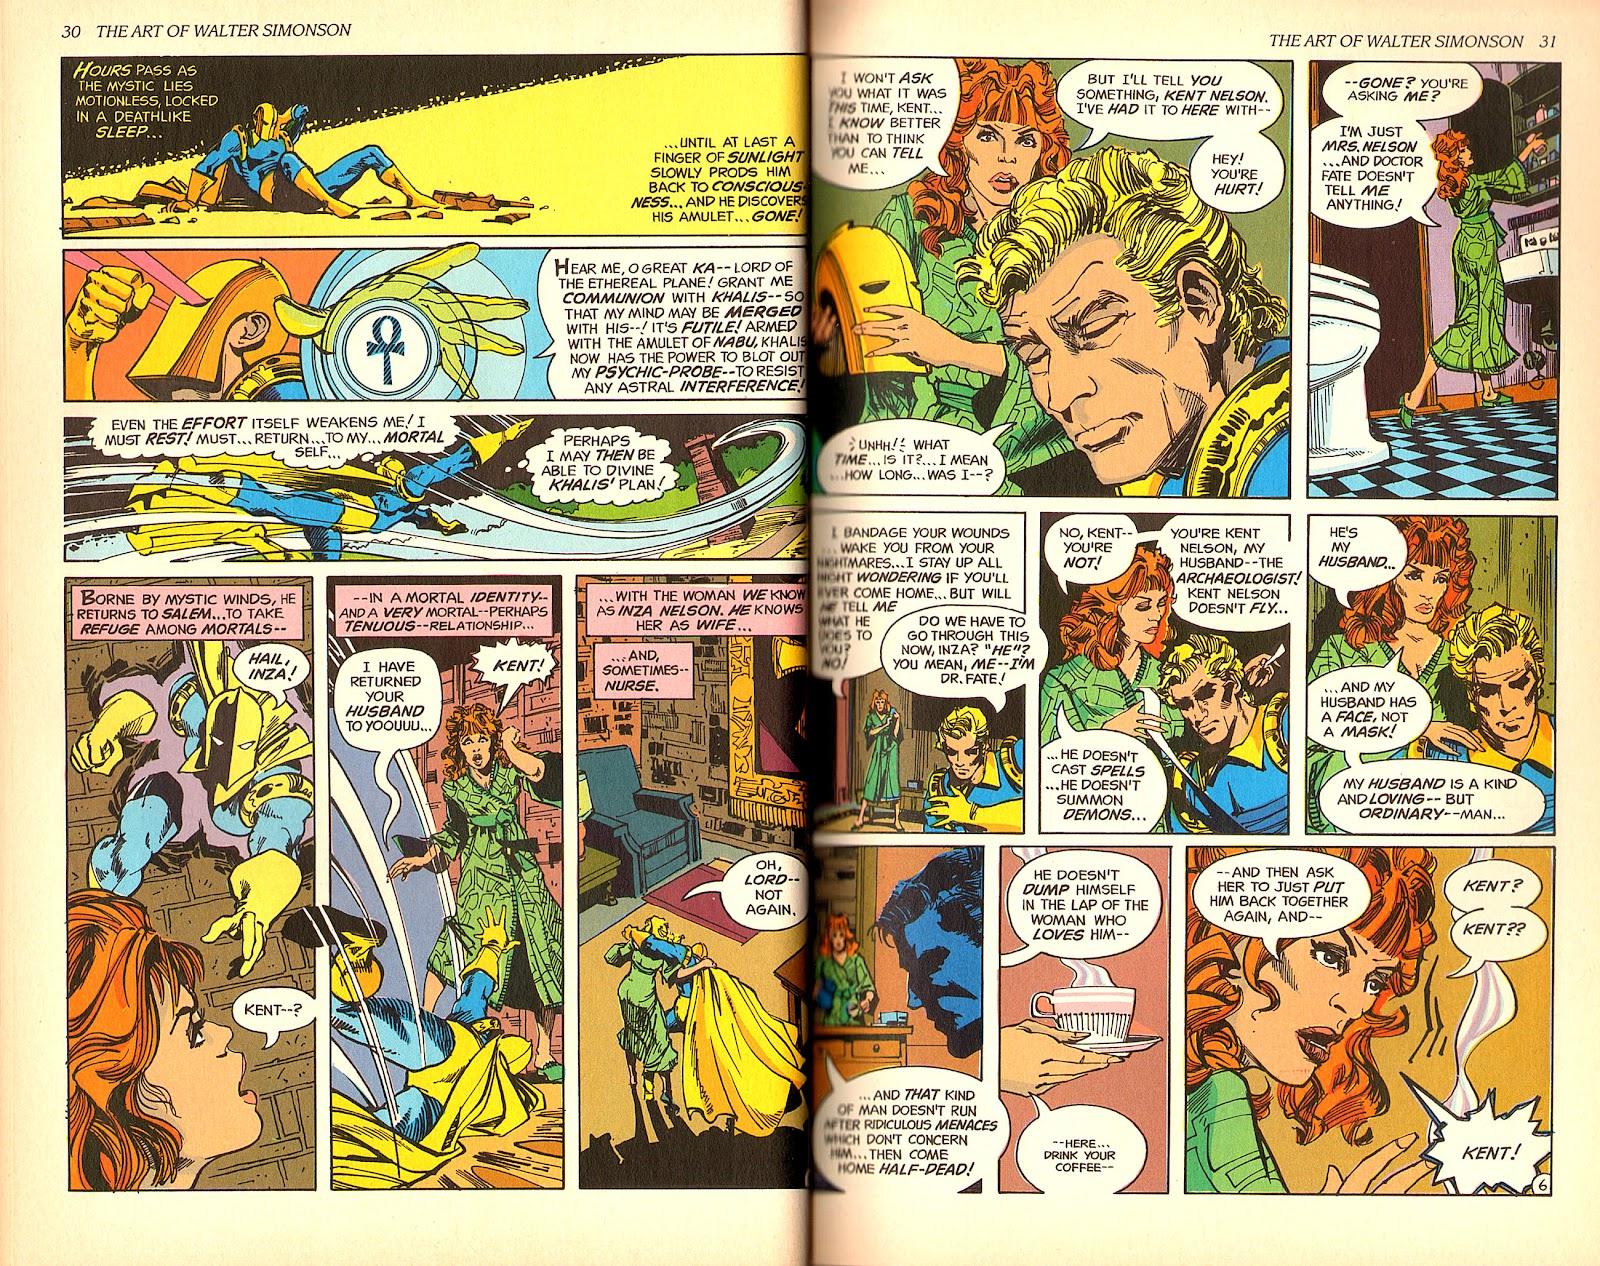 Read online The Art of Walter Simonson comic -  Issue # TPB - 17